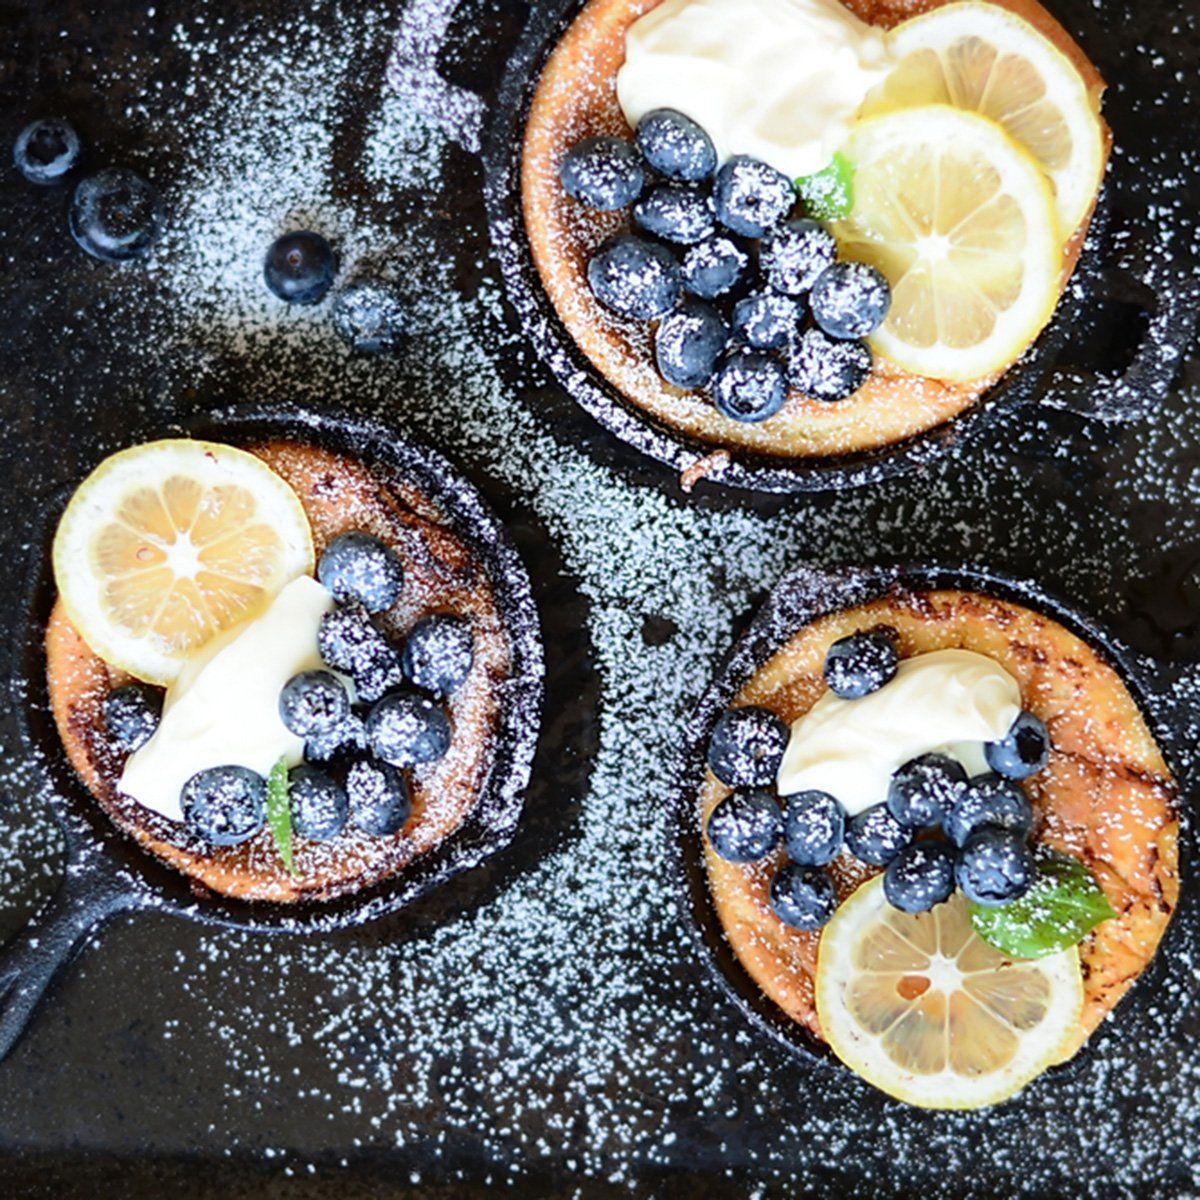 10 Adorable Mini CastIron Skillet Recipes  Mini Dutch Baby pancakes with fresh blueberries and Mascarpone Cream